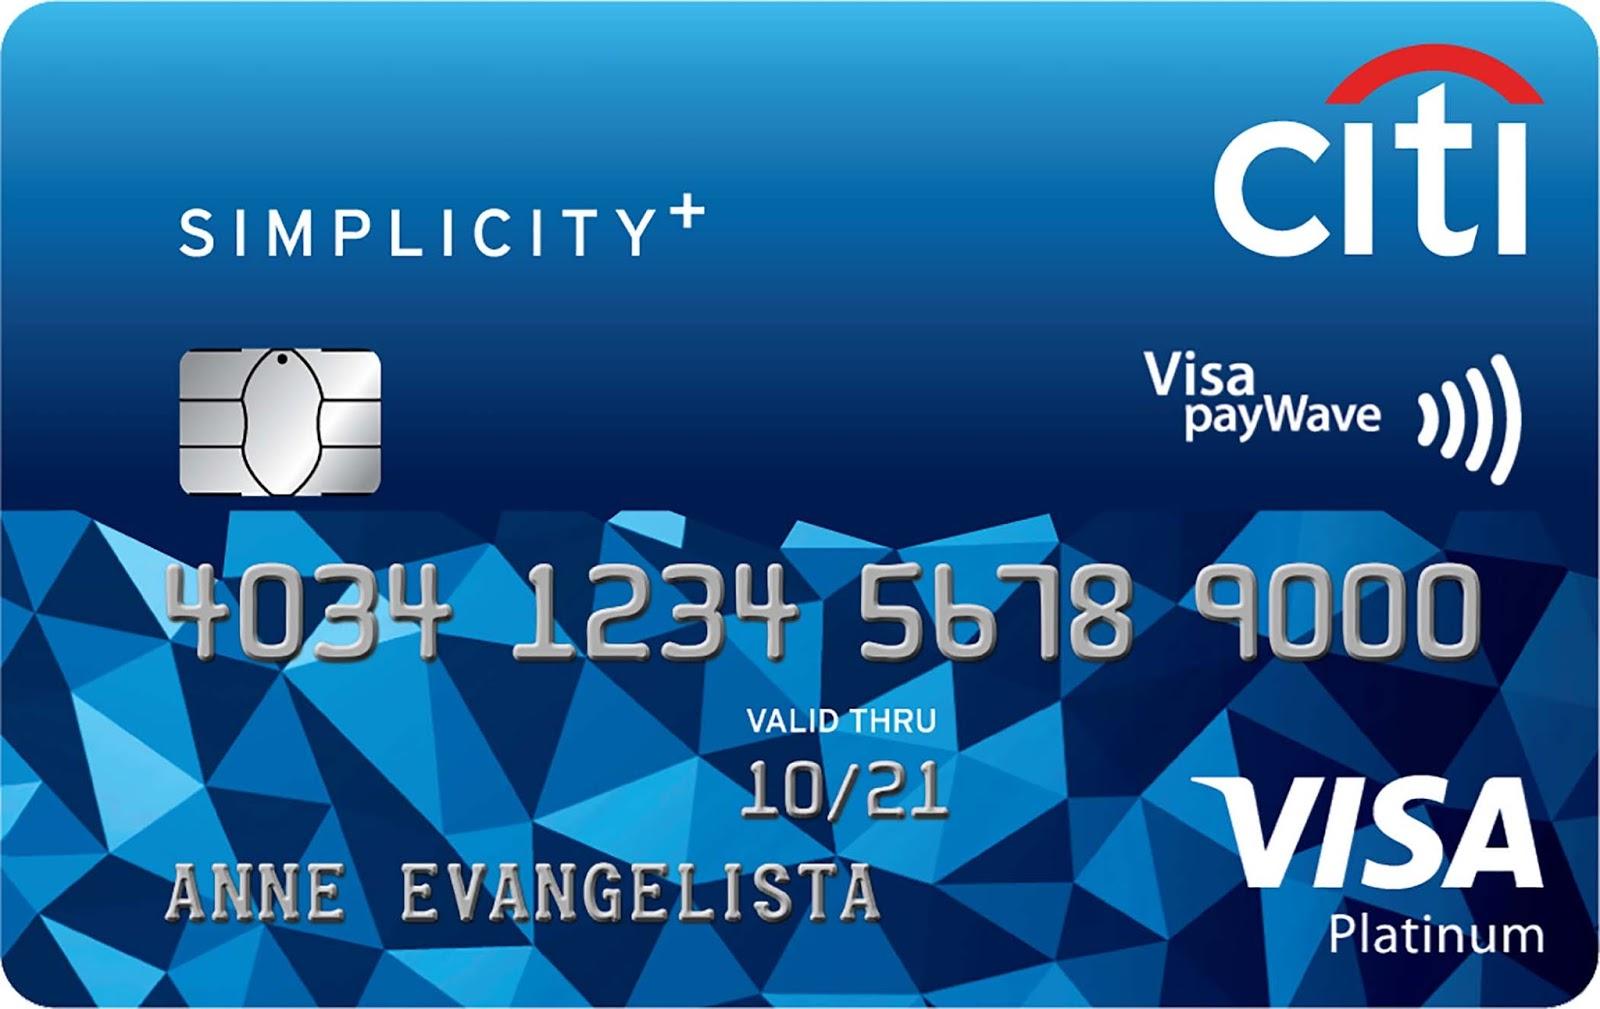 Asia Travel Book: 11張最好用的信用卡,月入RM2000都能申請!